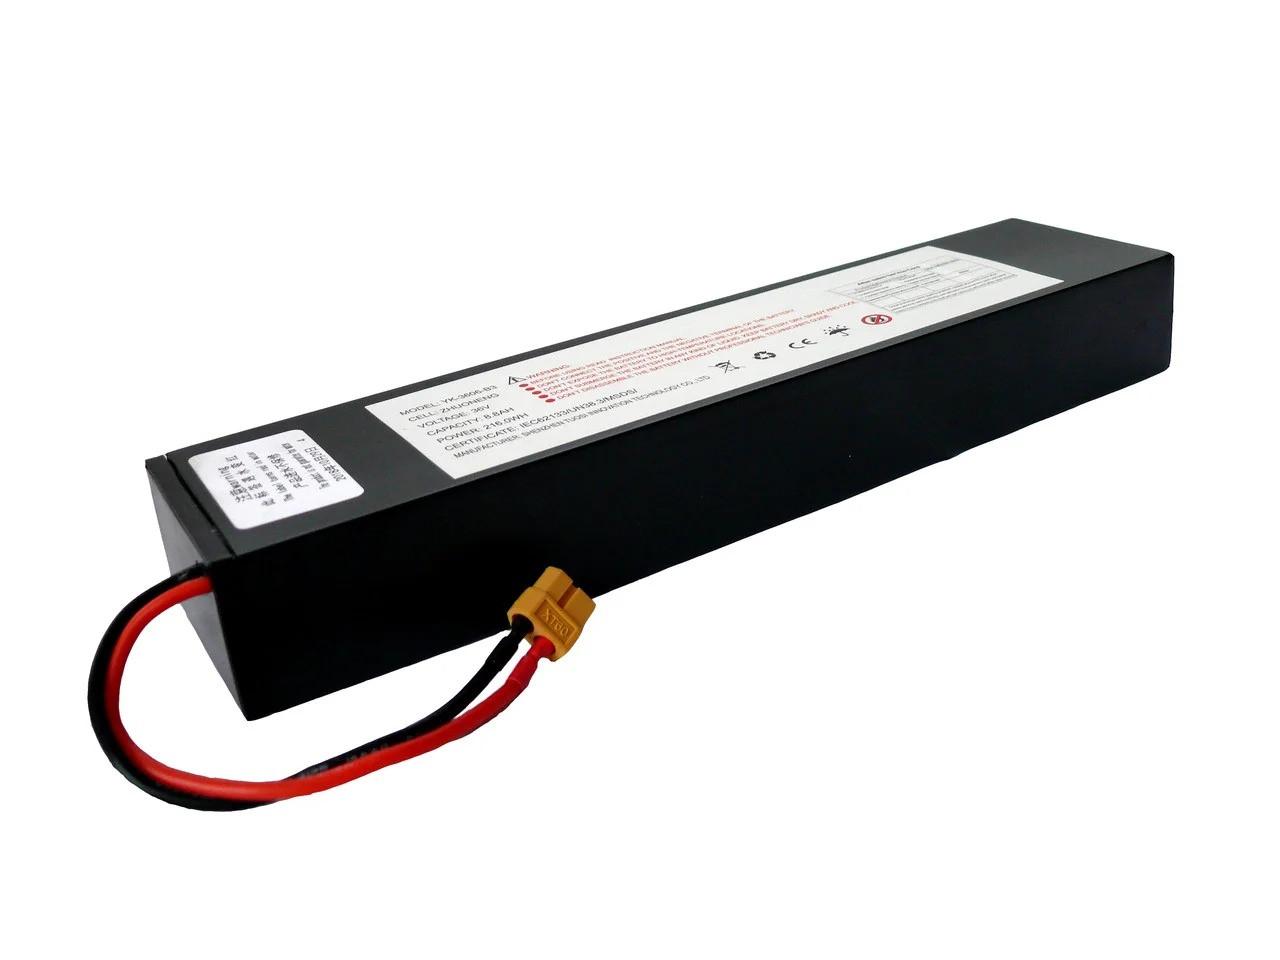 Аккумулятор для электросамоката Kugoo S3 7.8 Ah 36V - фото 2